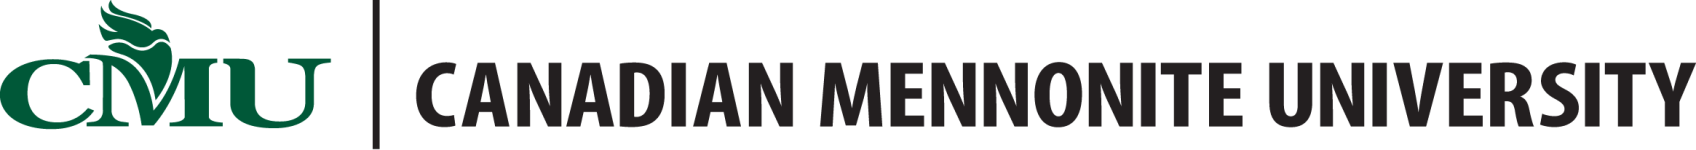 Logo de Canadian Mennonite University